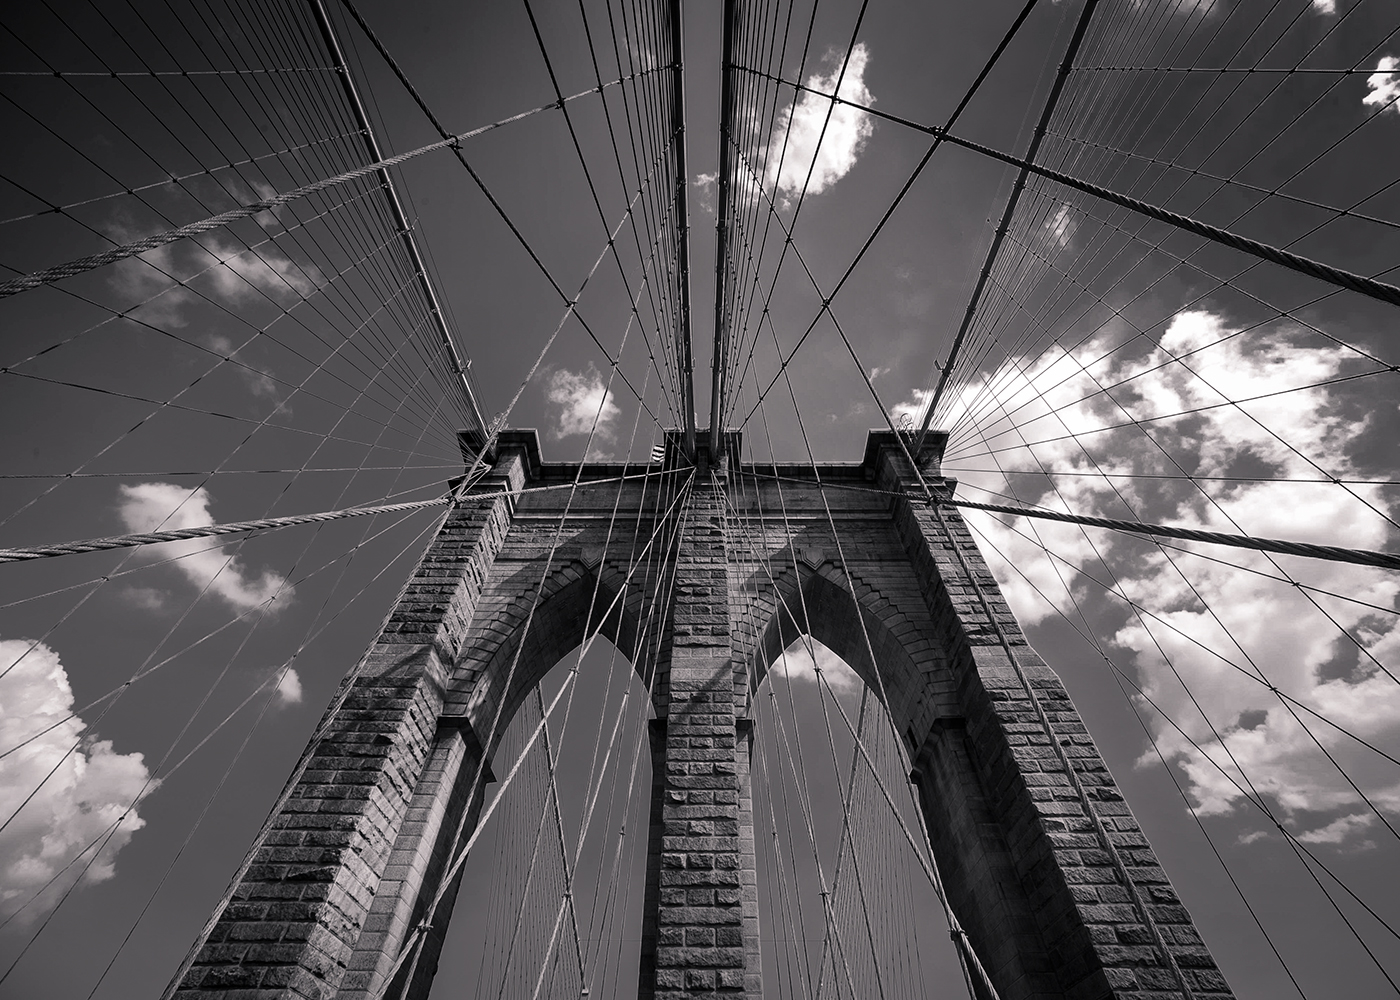 black and white image of brooklyn bridge by mrpkalu